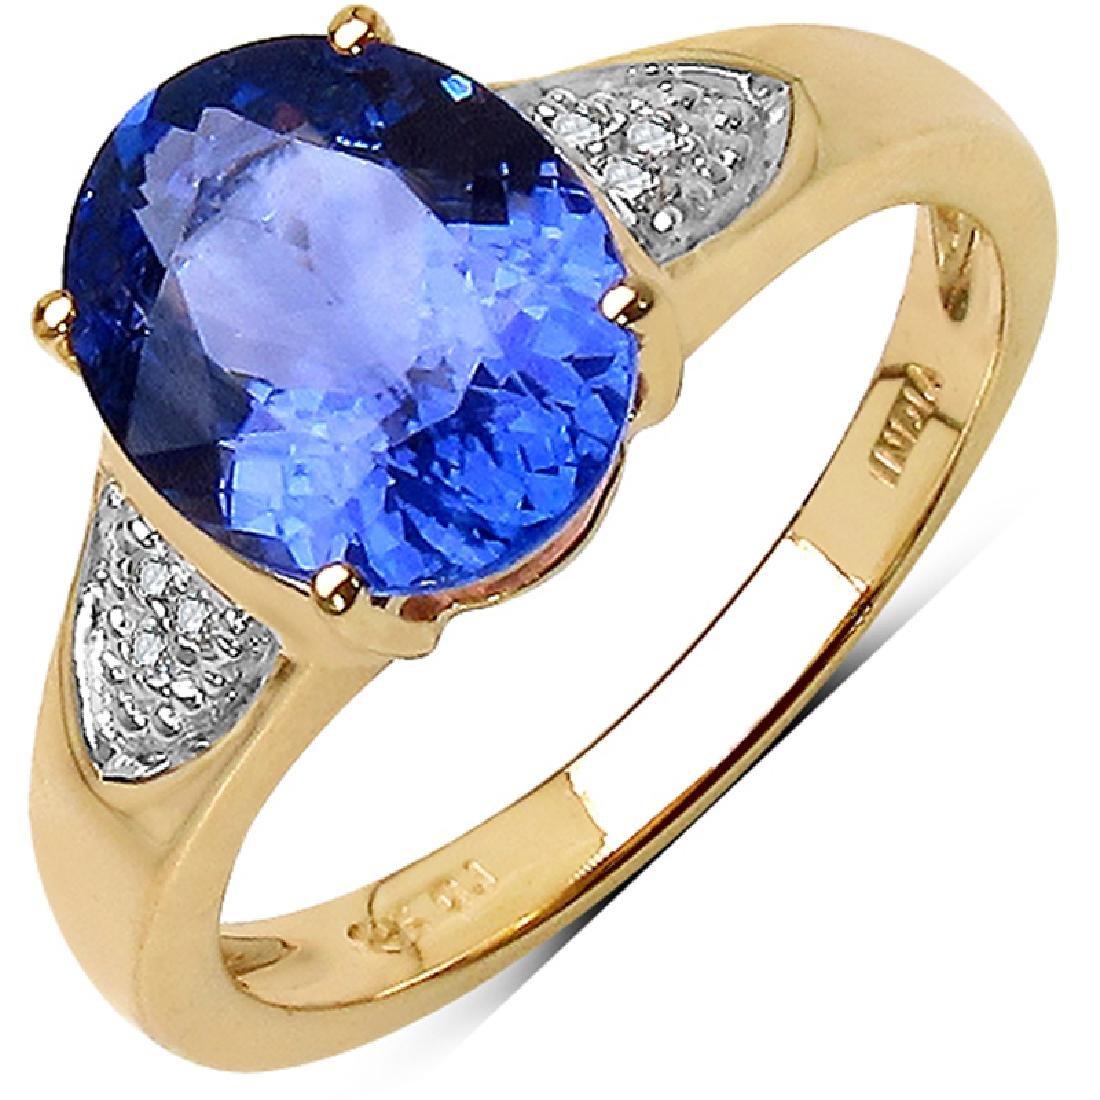 APP: 4.5k *Fine Jewelry 14 kt. White/Yellow Gold,